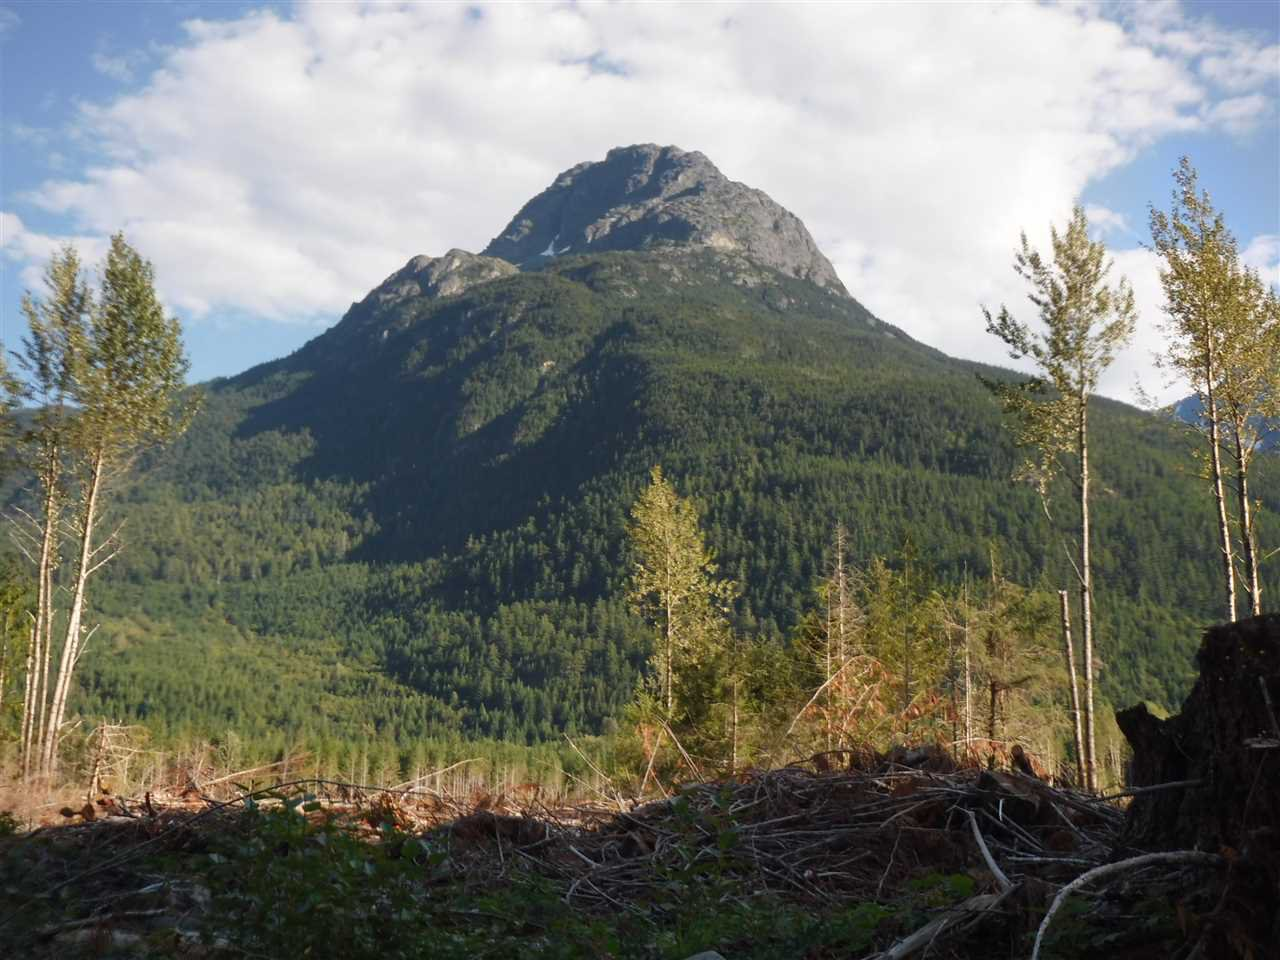 Photo 16: Photos: 3975 EAST HAMMER Road in Bella Coola: Bella Coola/Hagensborg Land for sale (Williams Lake (Zone 27))  : MLS®# R2483527